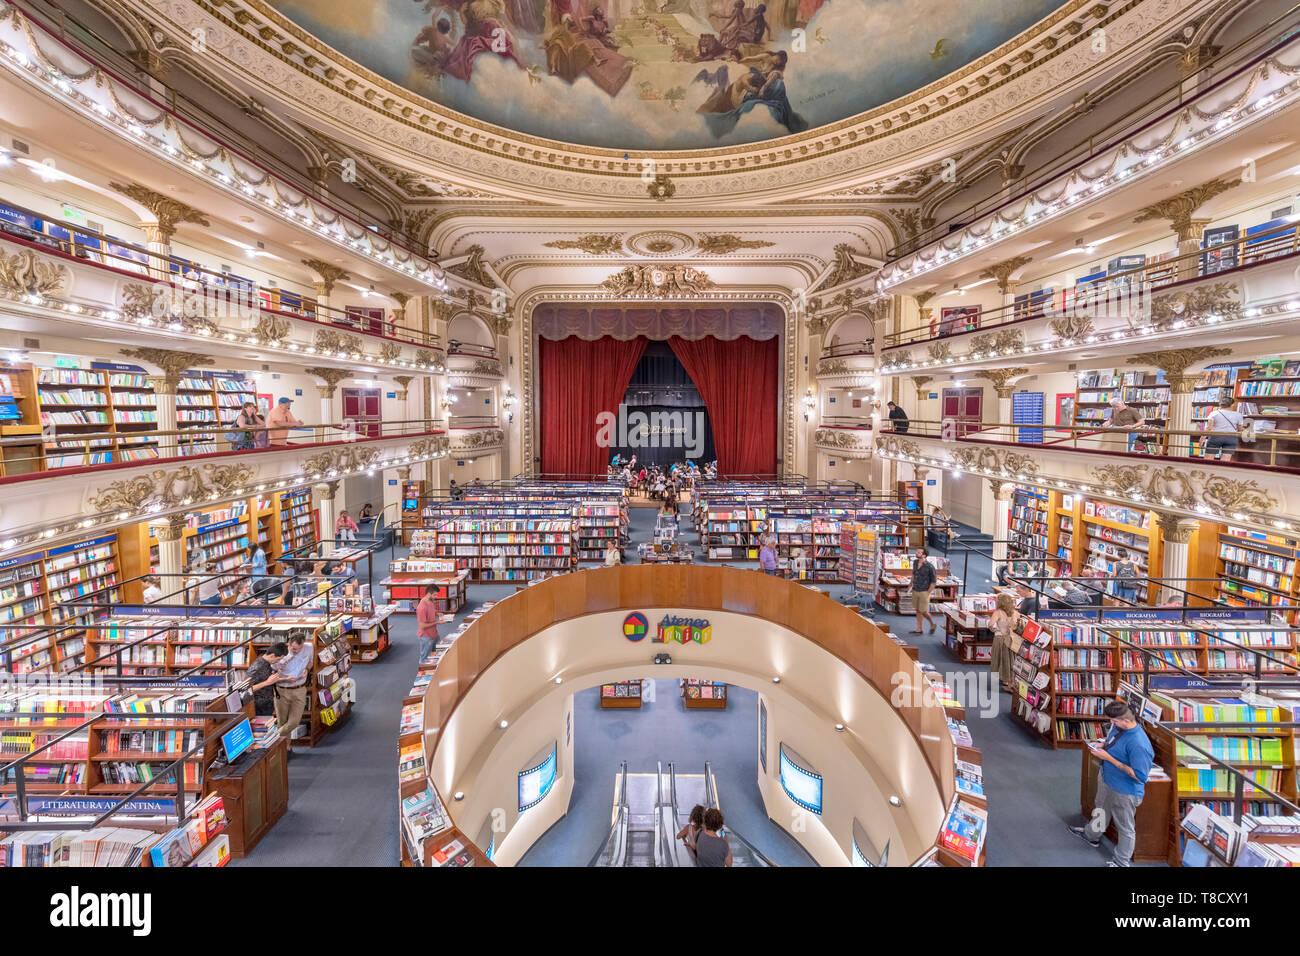 El Ateneo bookshop, Buenos Aires. Interior of the Ateneo Grand Splendid bookstore, a former theatre on Avenida Santa Fe, Buenos Aires, Argentina - Stock Image